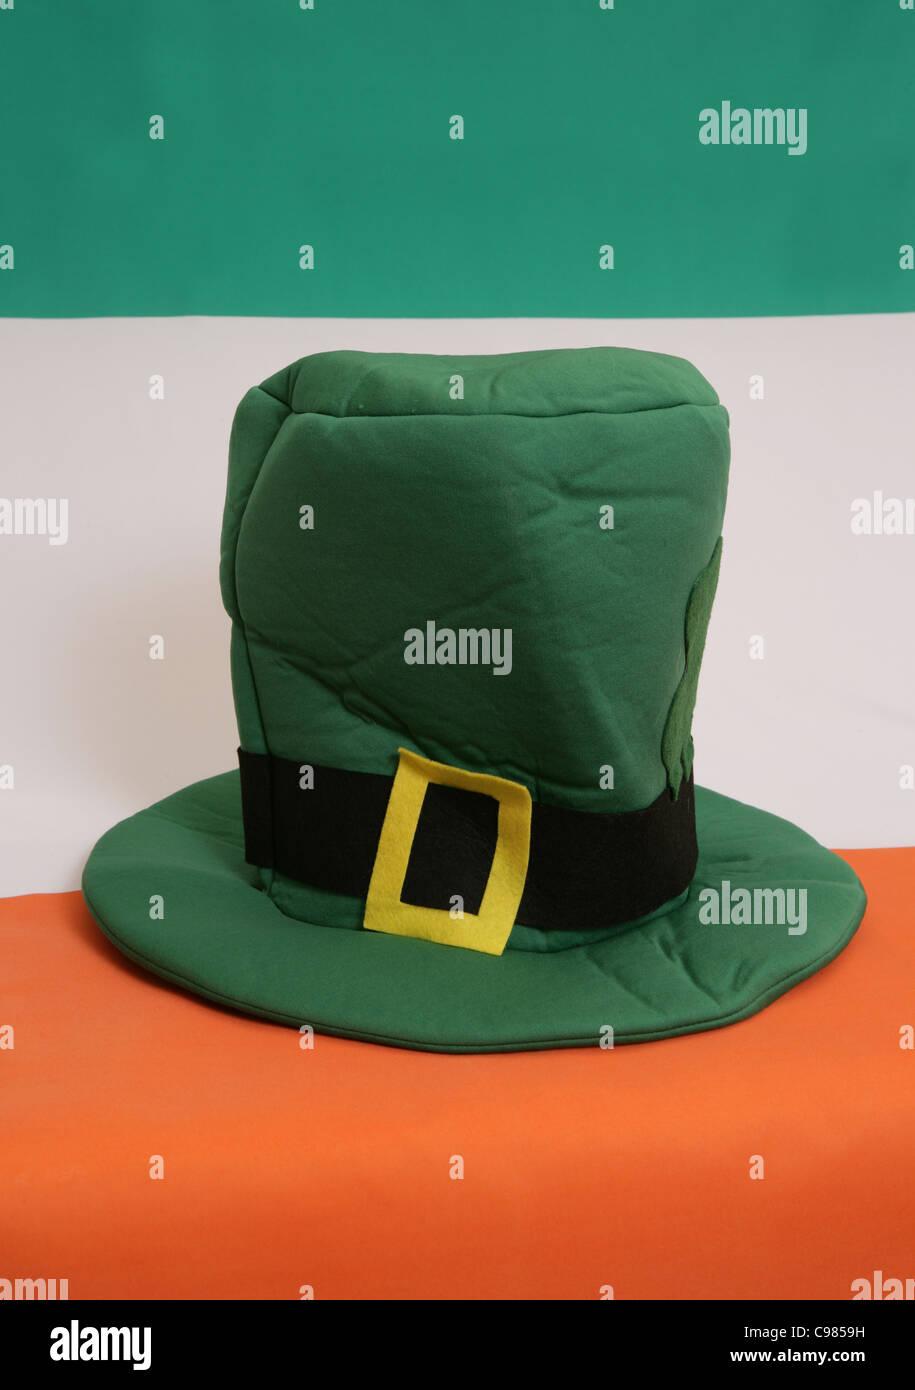 St patricks day hat on and irish flag - Stock Image